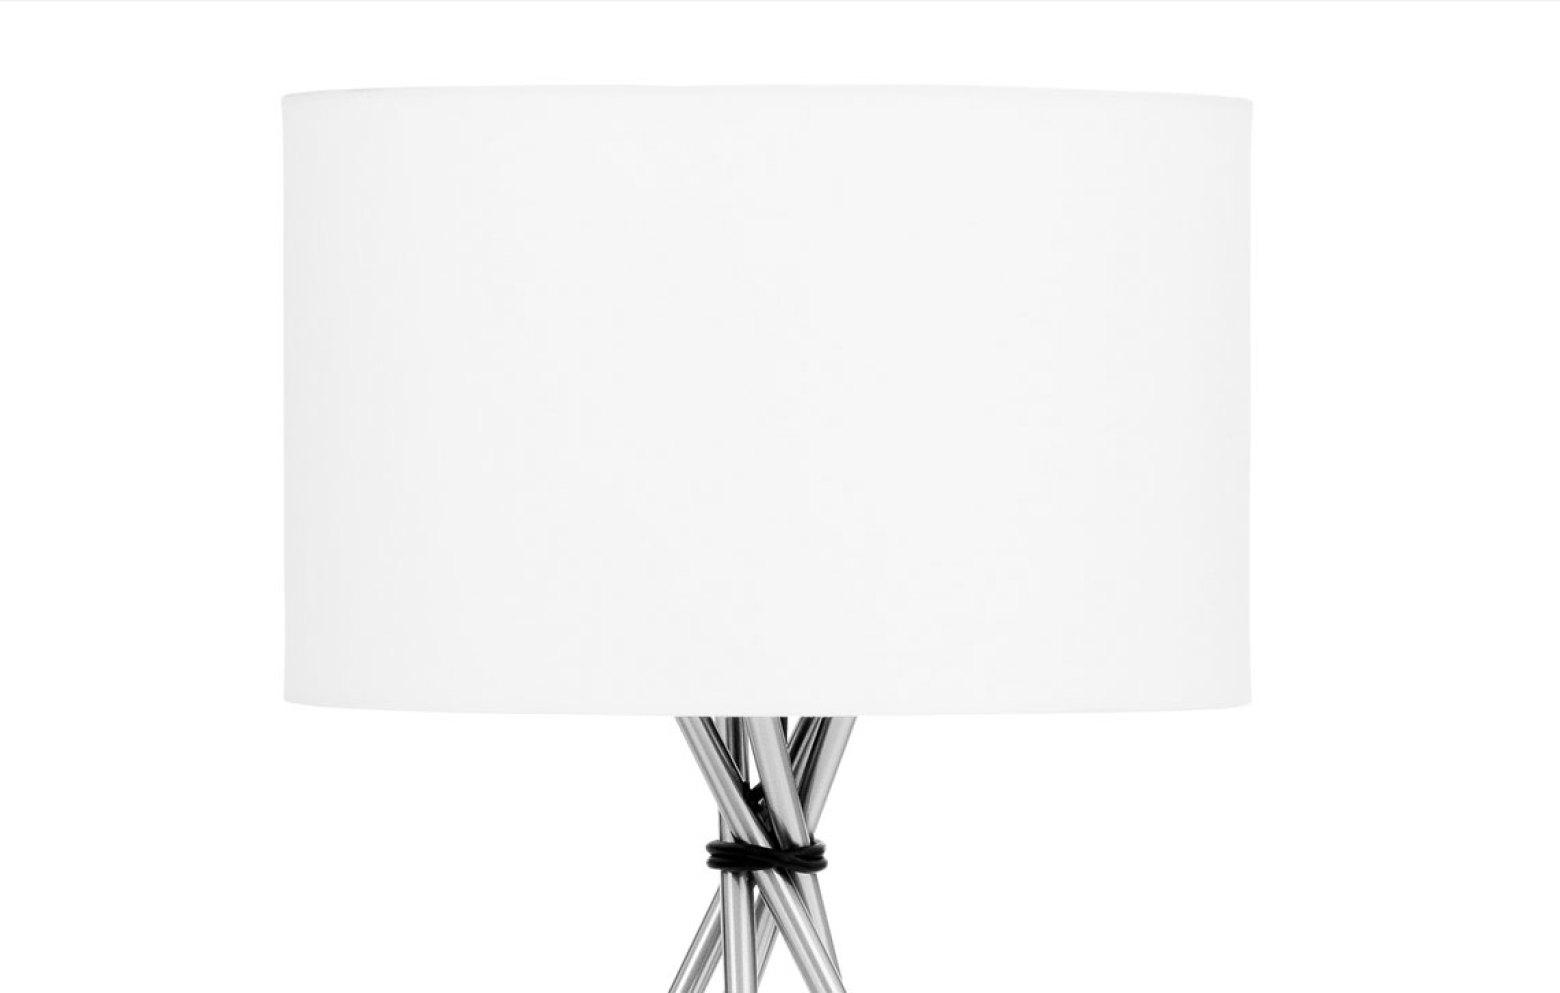 lima lampen kleinm bel accessoires who 39 s perfect. Black Bedroom Furniture Sets. Home Design Ideas